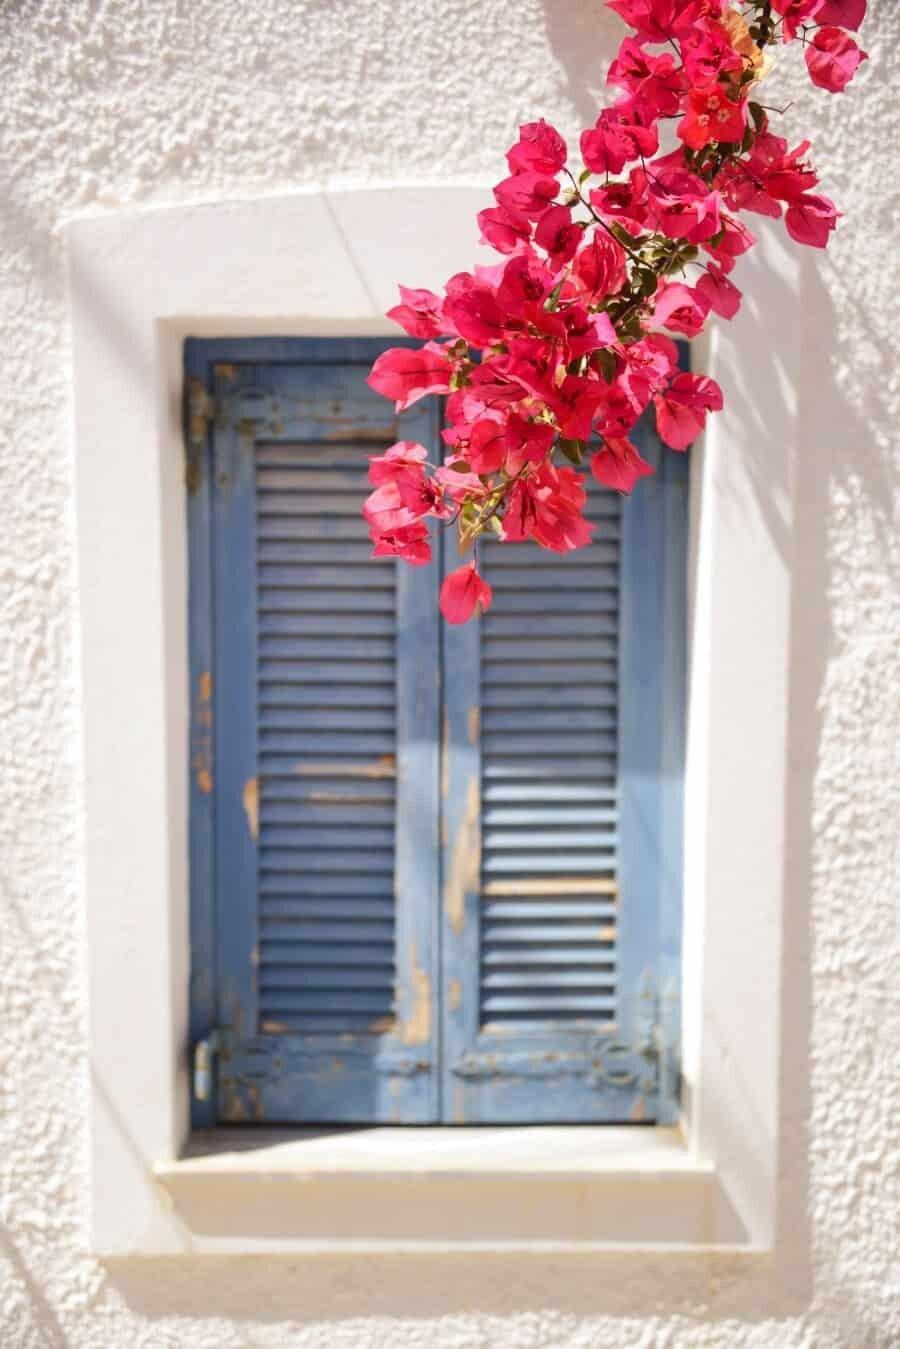 paros-island-greek-islands-by-the-wandering-lens-11